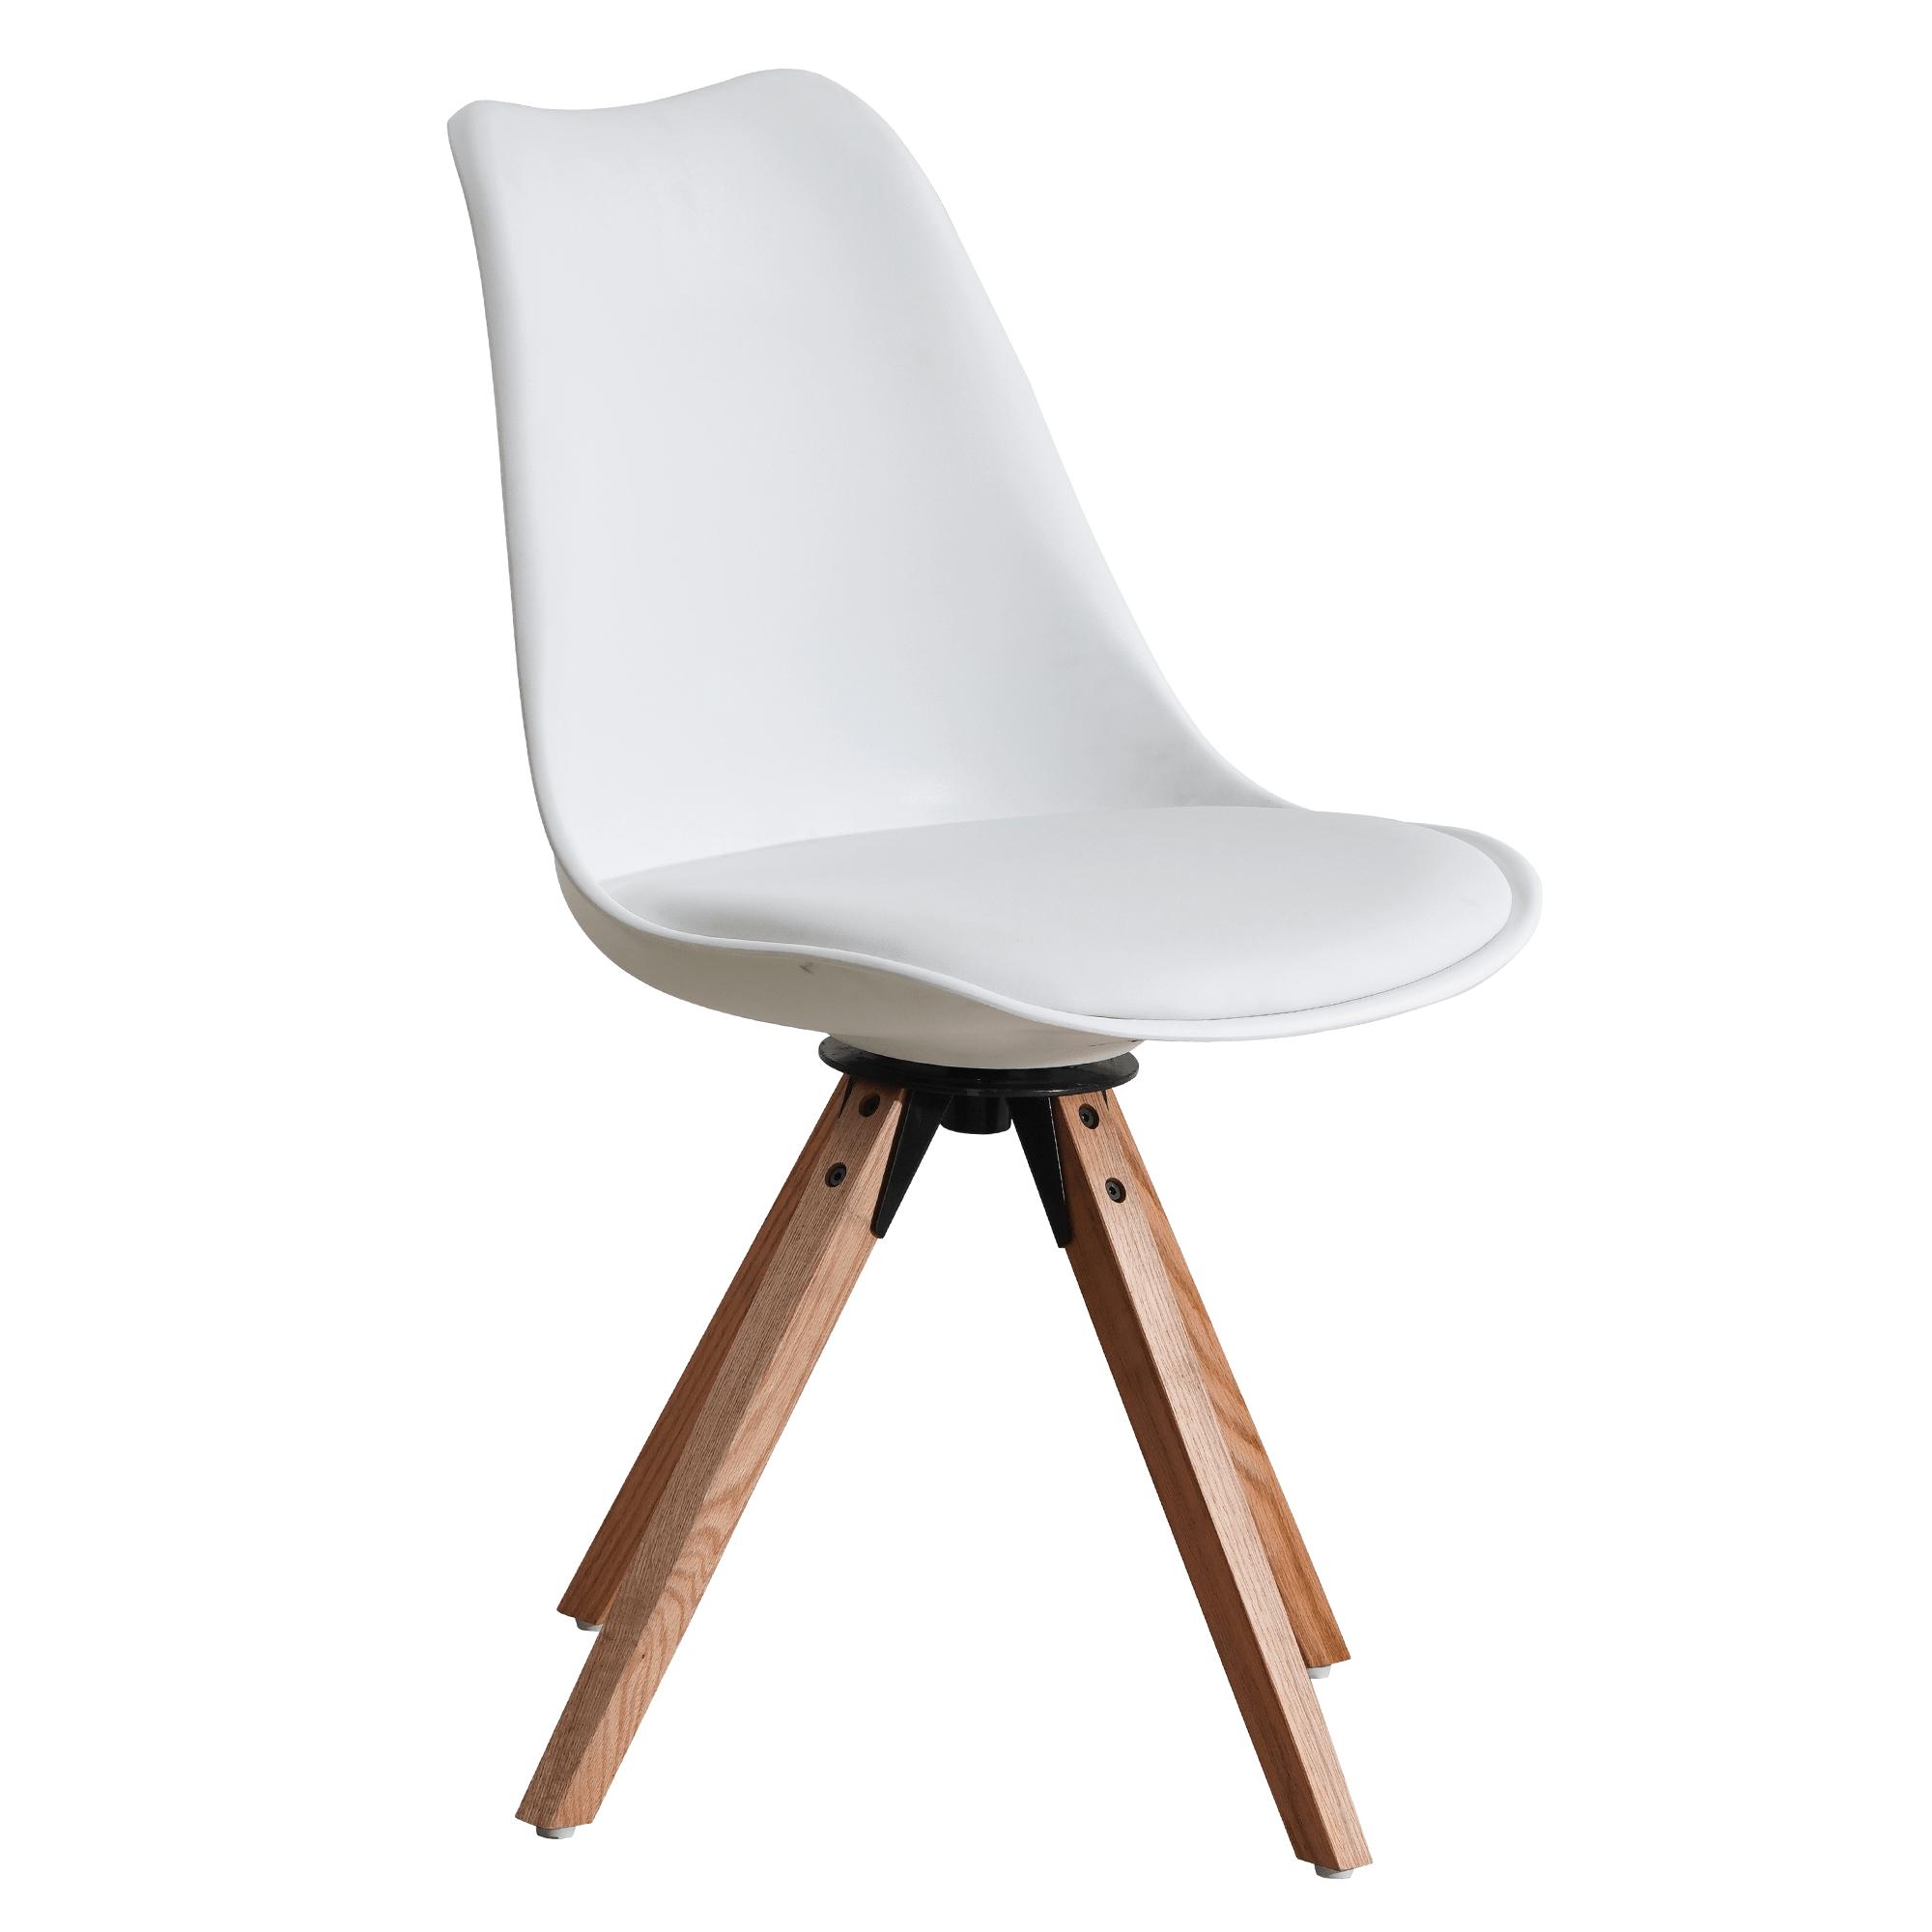 Štýlová otočná stolička